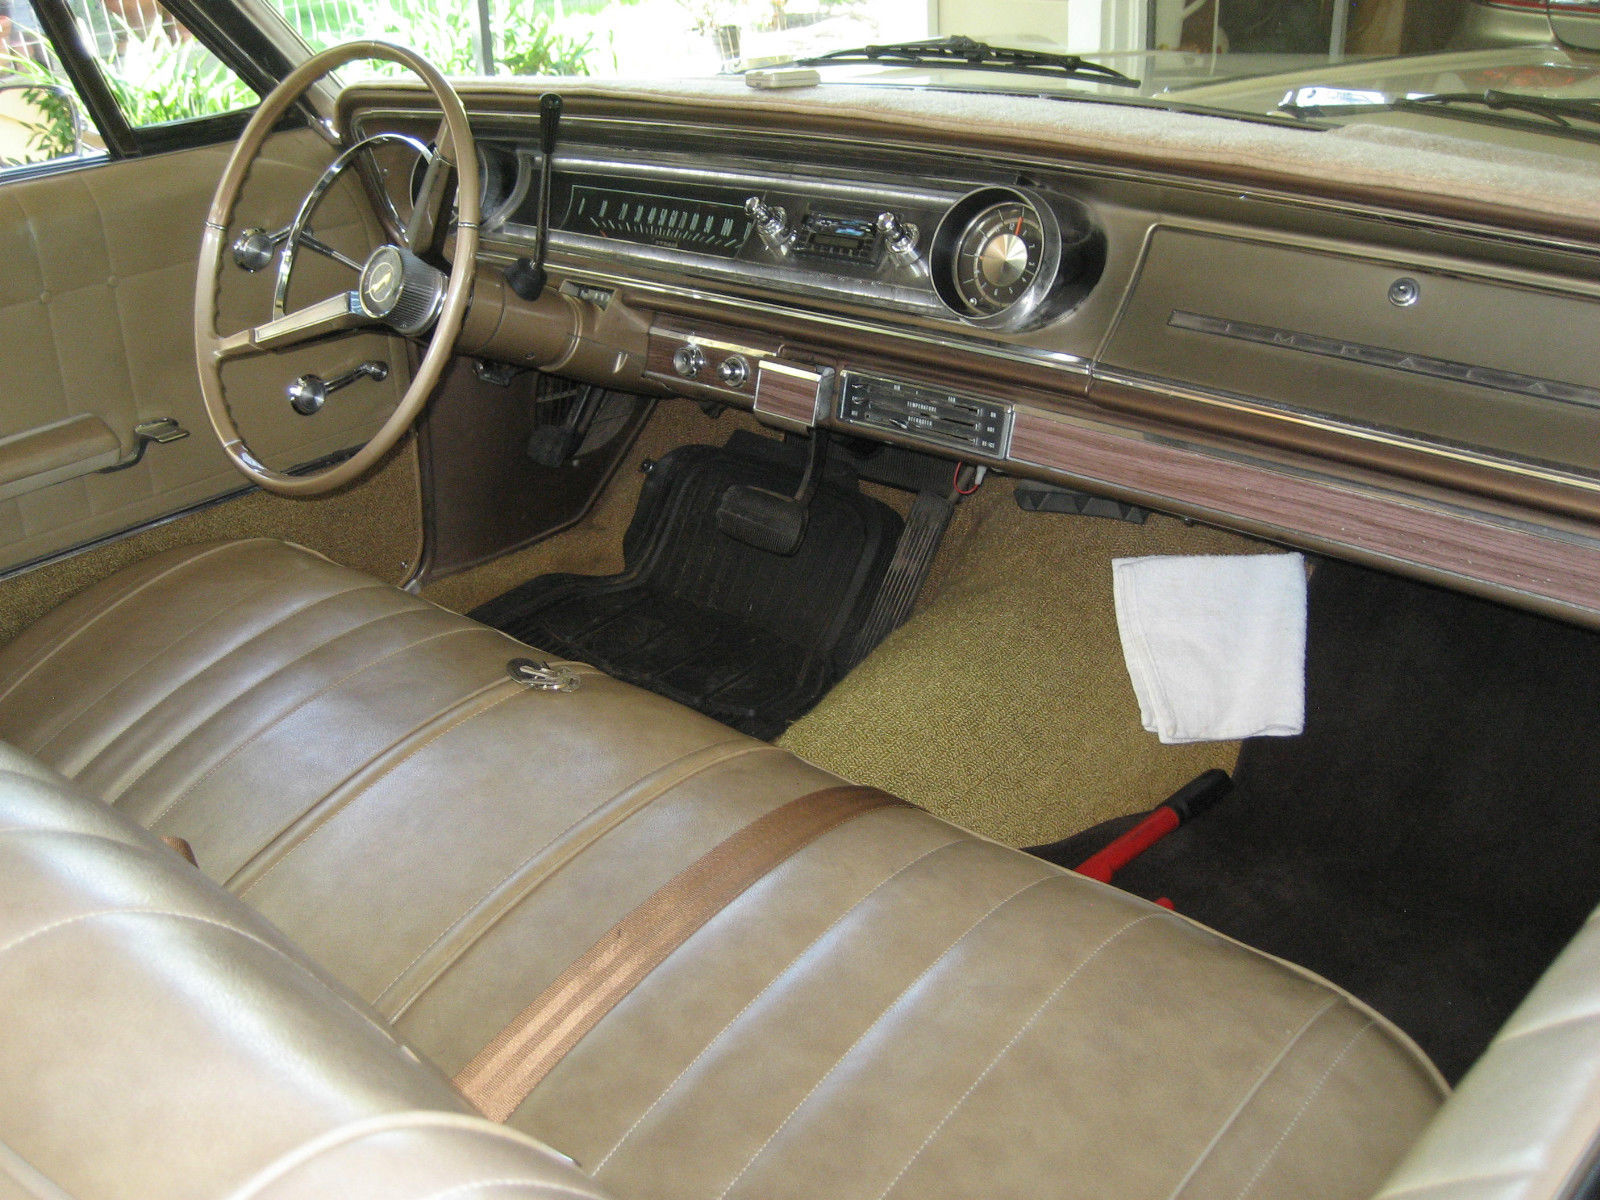 1965 chevrolet impala ss used cars for sale autos weblog. Black Bedroom Furniture Sets. Home Design Ideas